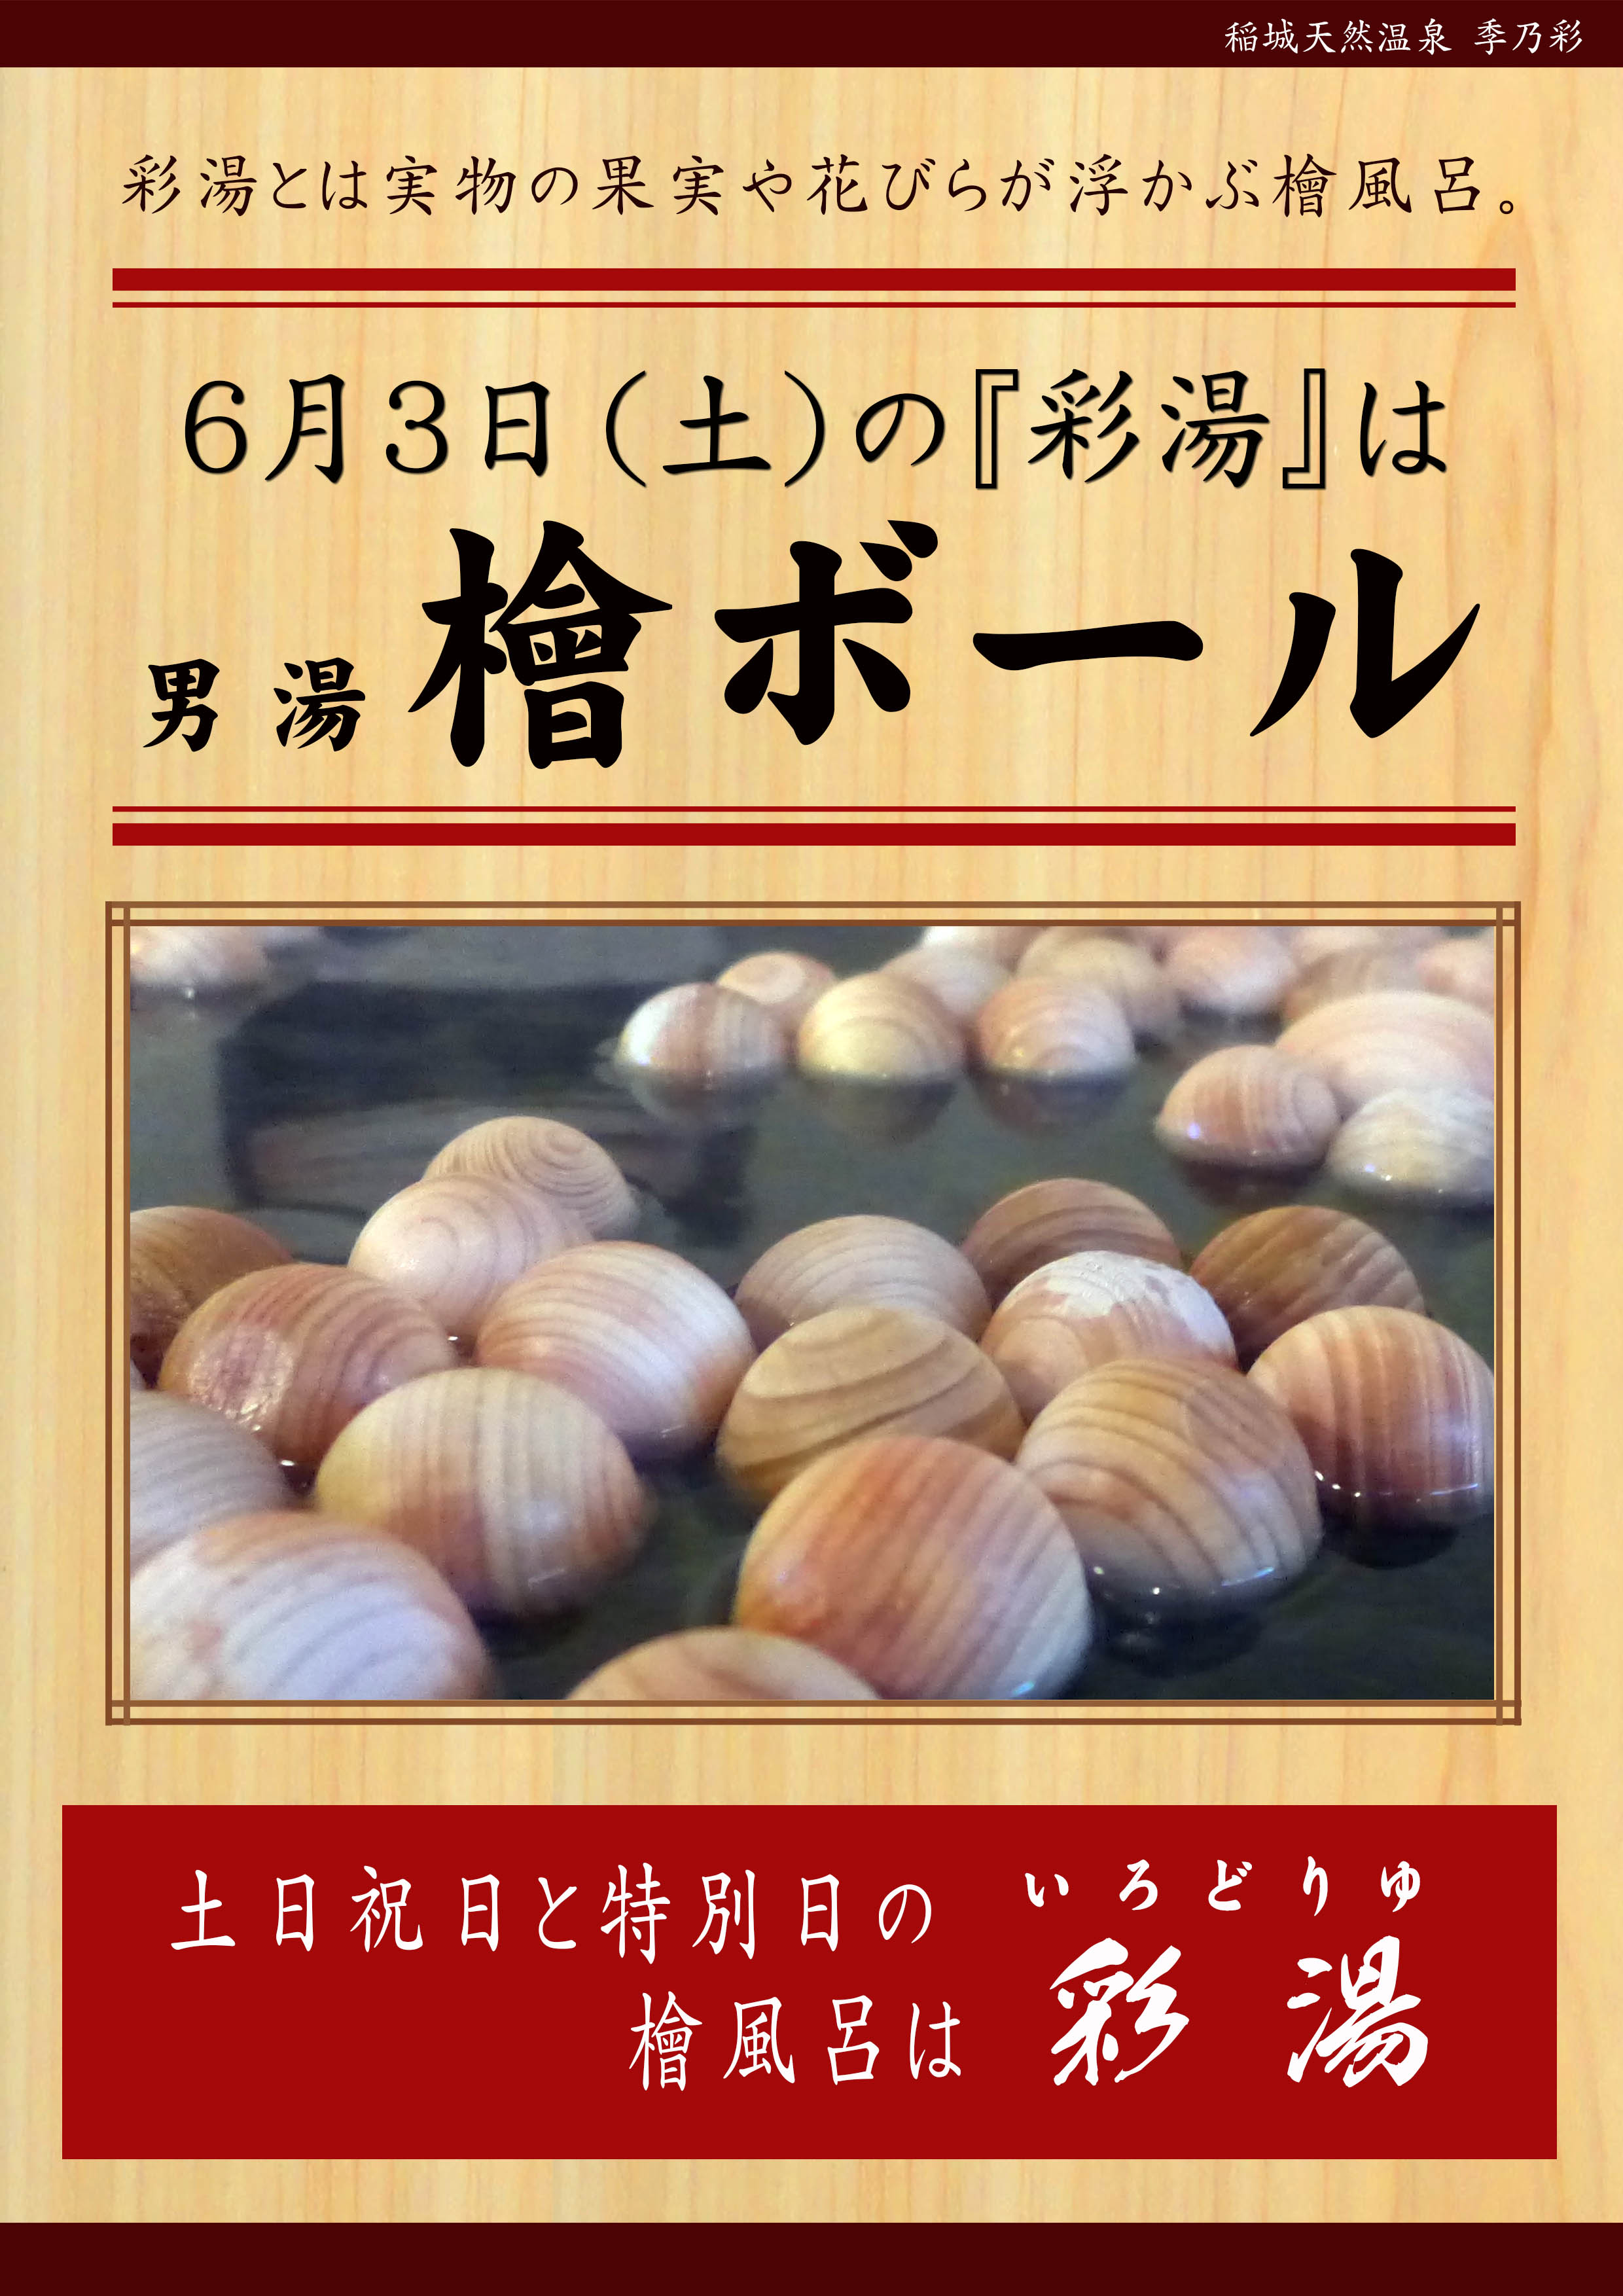 20170603POP イベント 彩湯 男湯 檜ボール